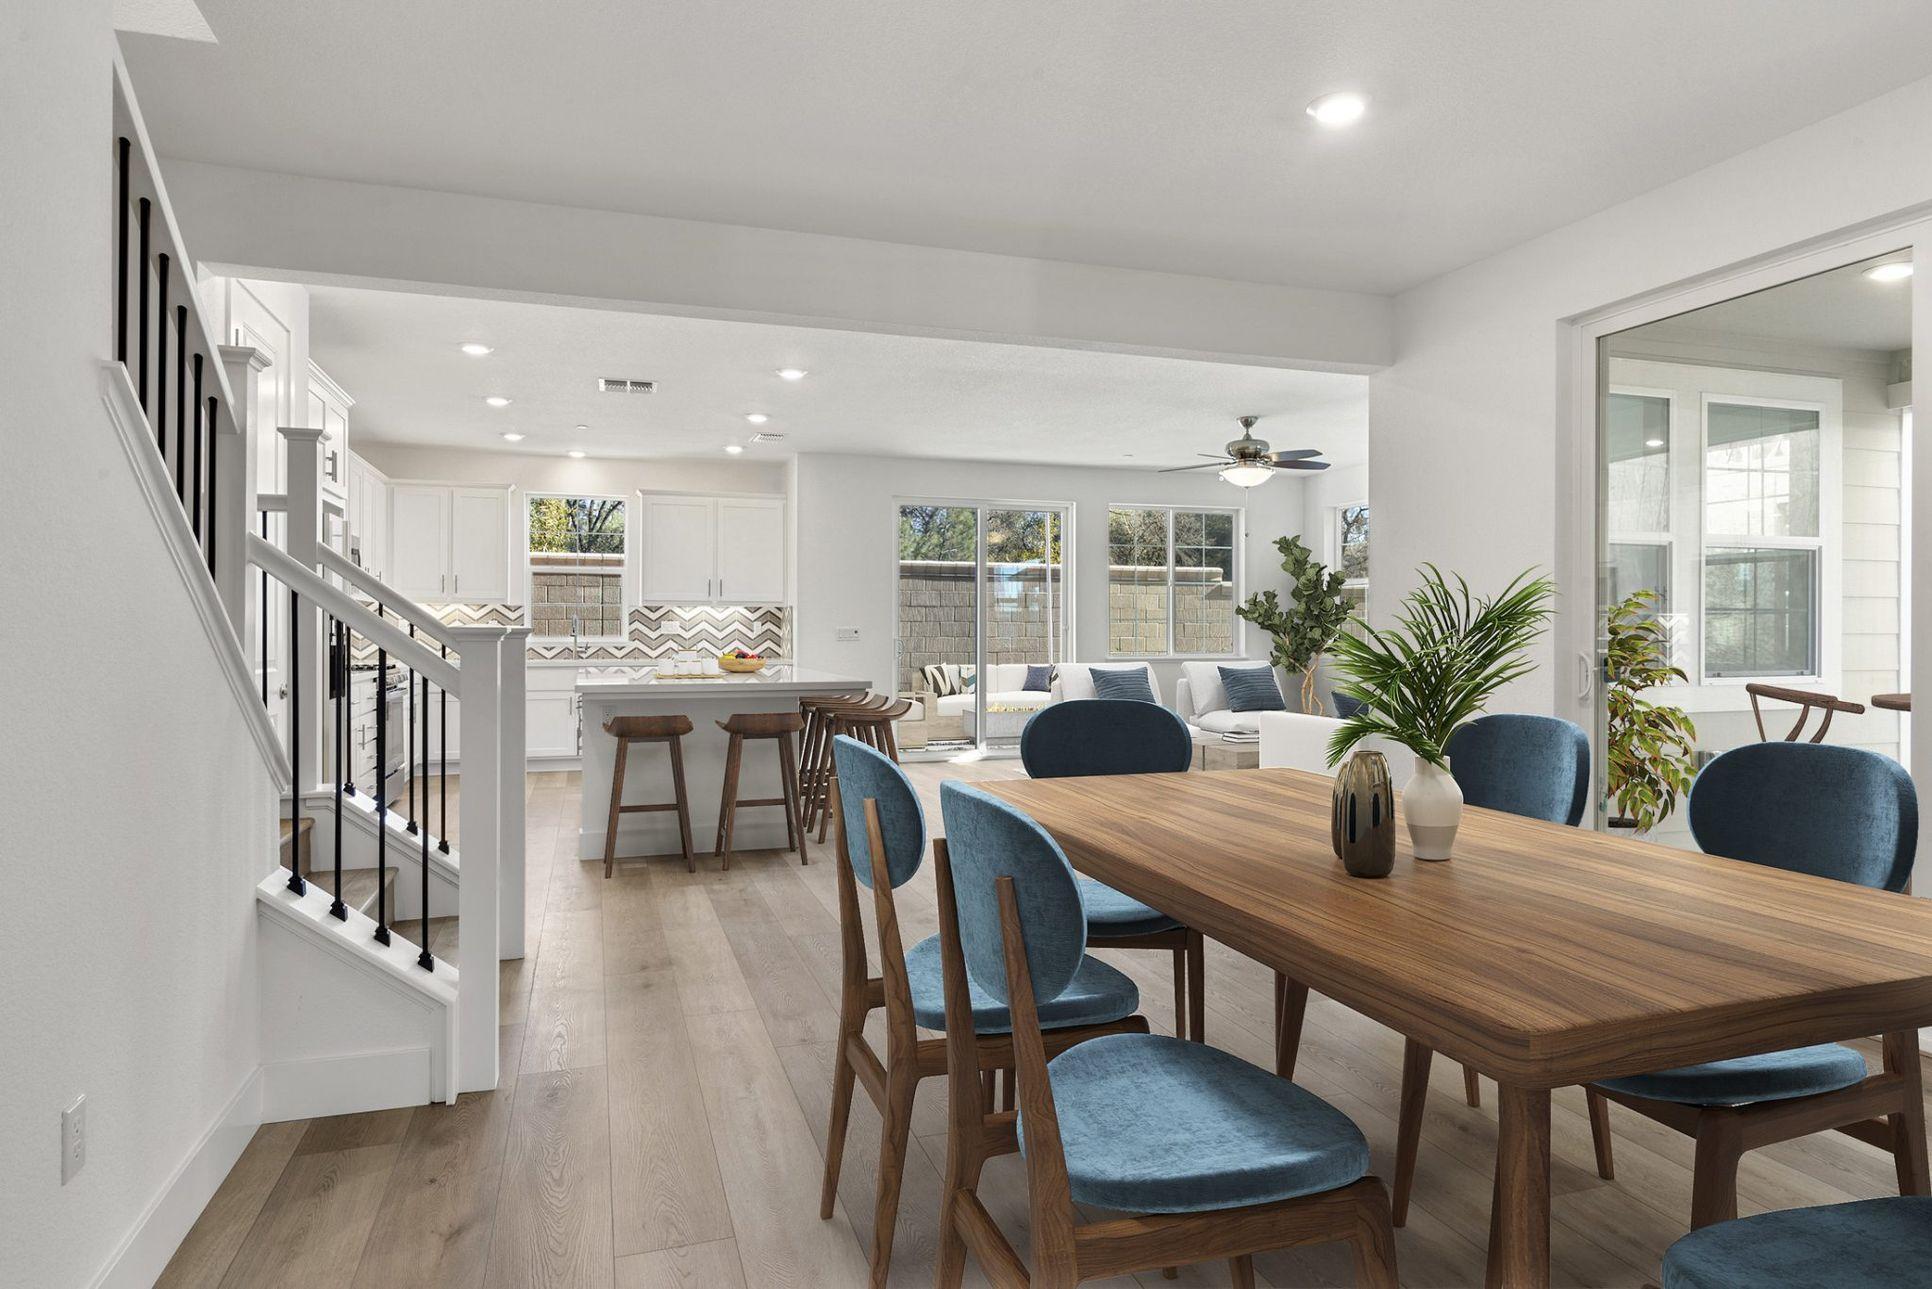 NEW HOMES FOR SALE GRANITE BAY